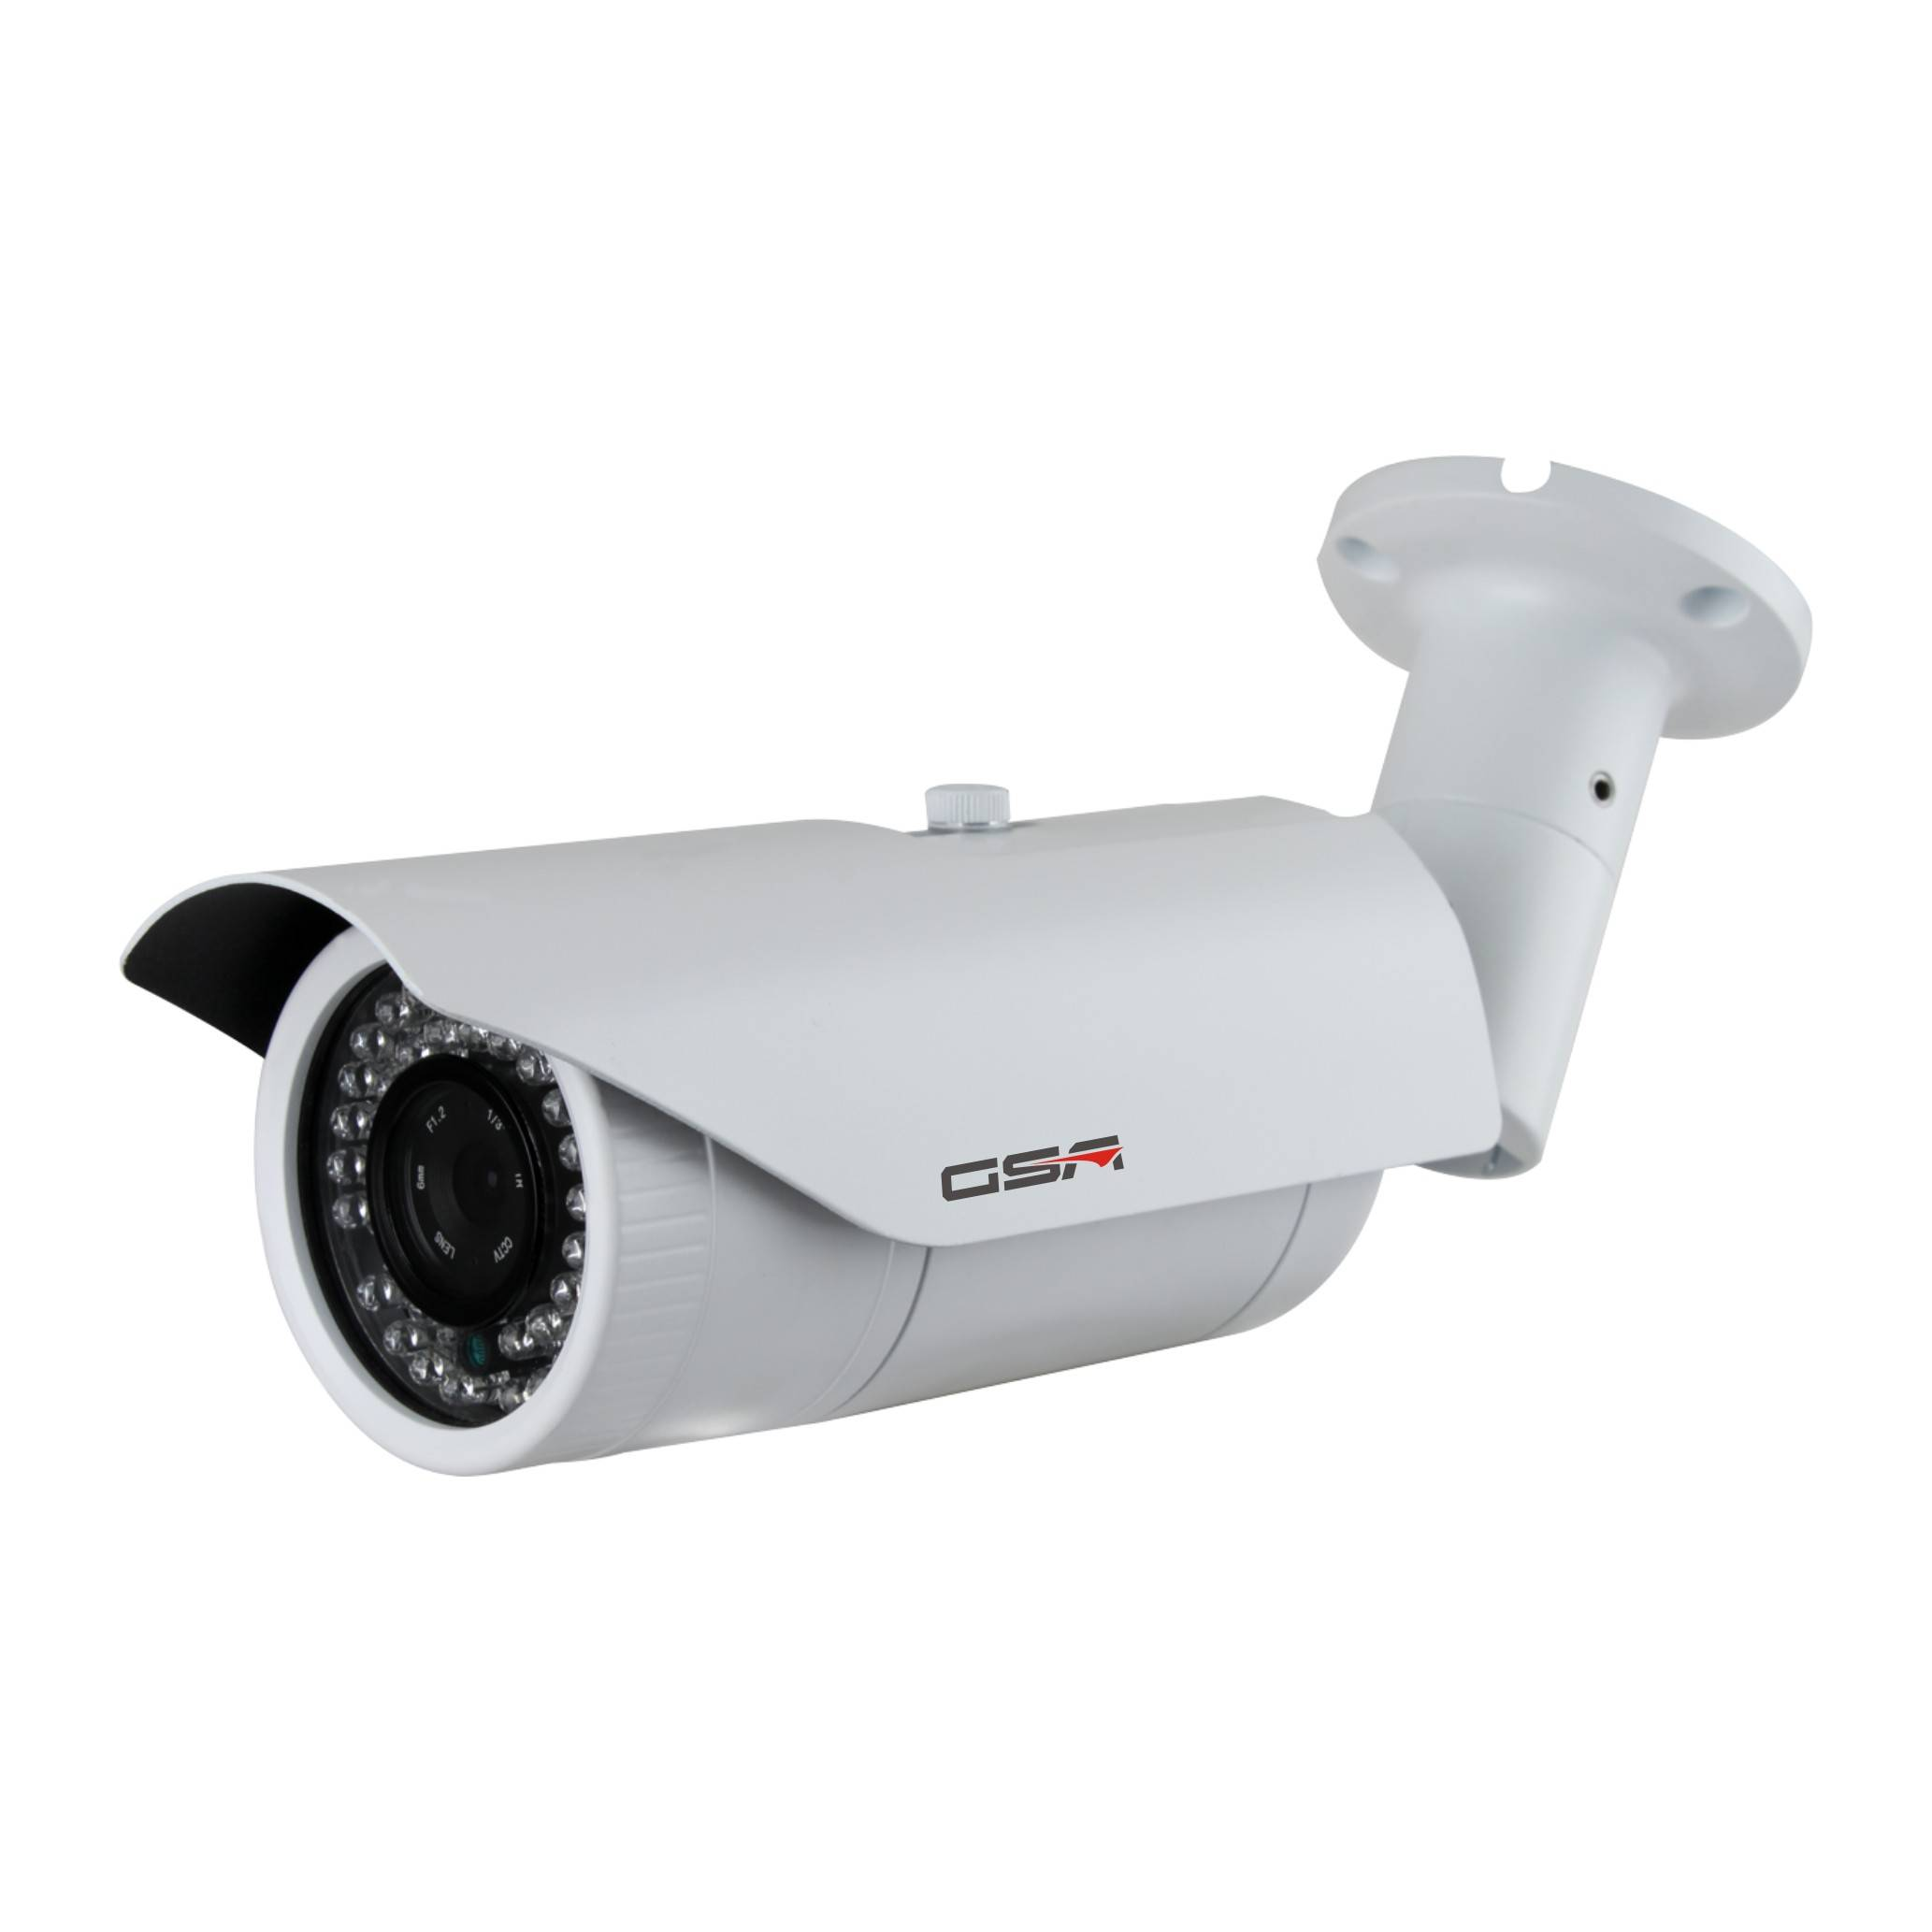 Outdoor Waterproof Security CCD IR CCTV Camera